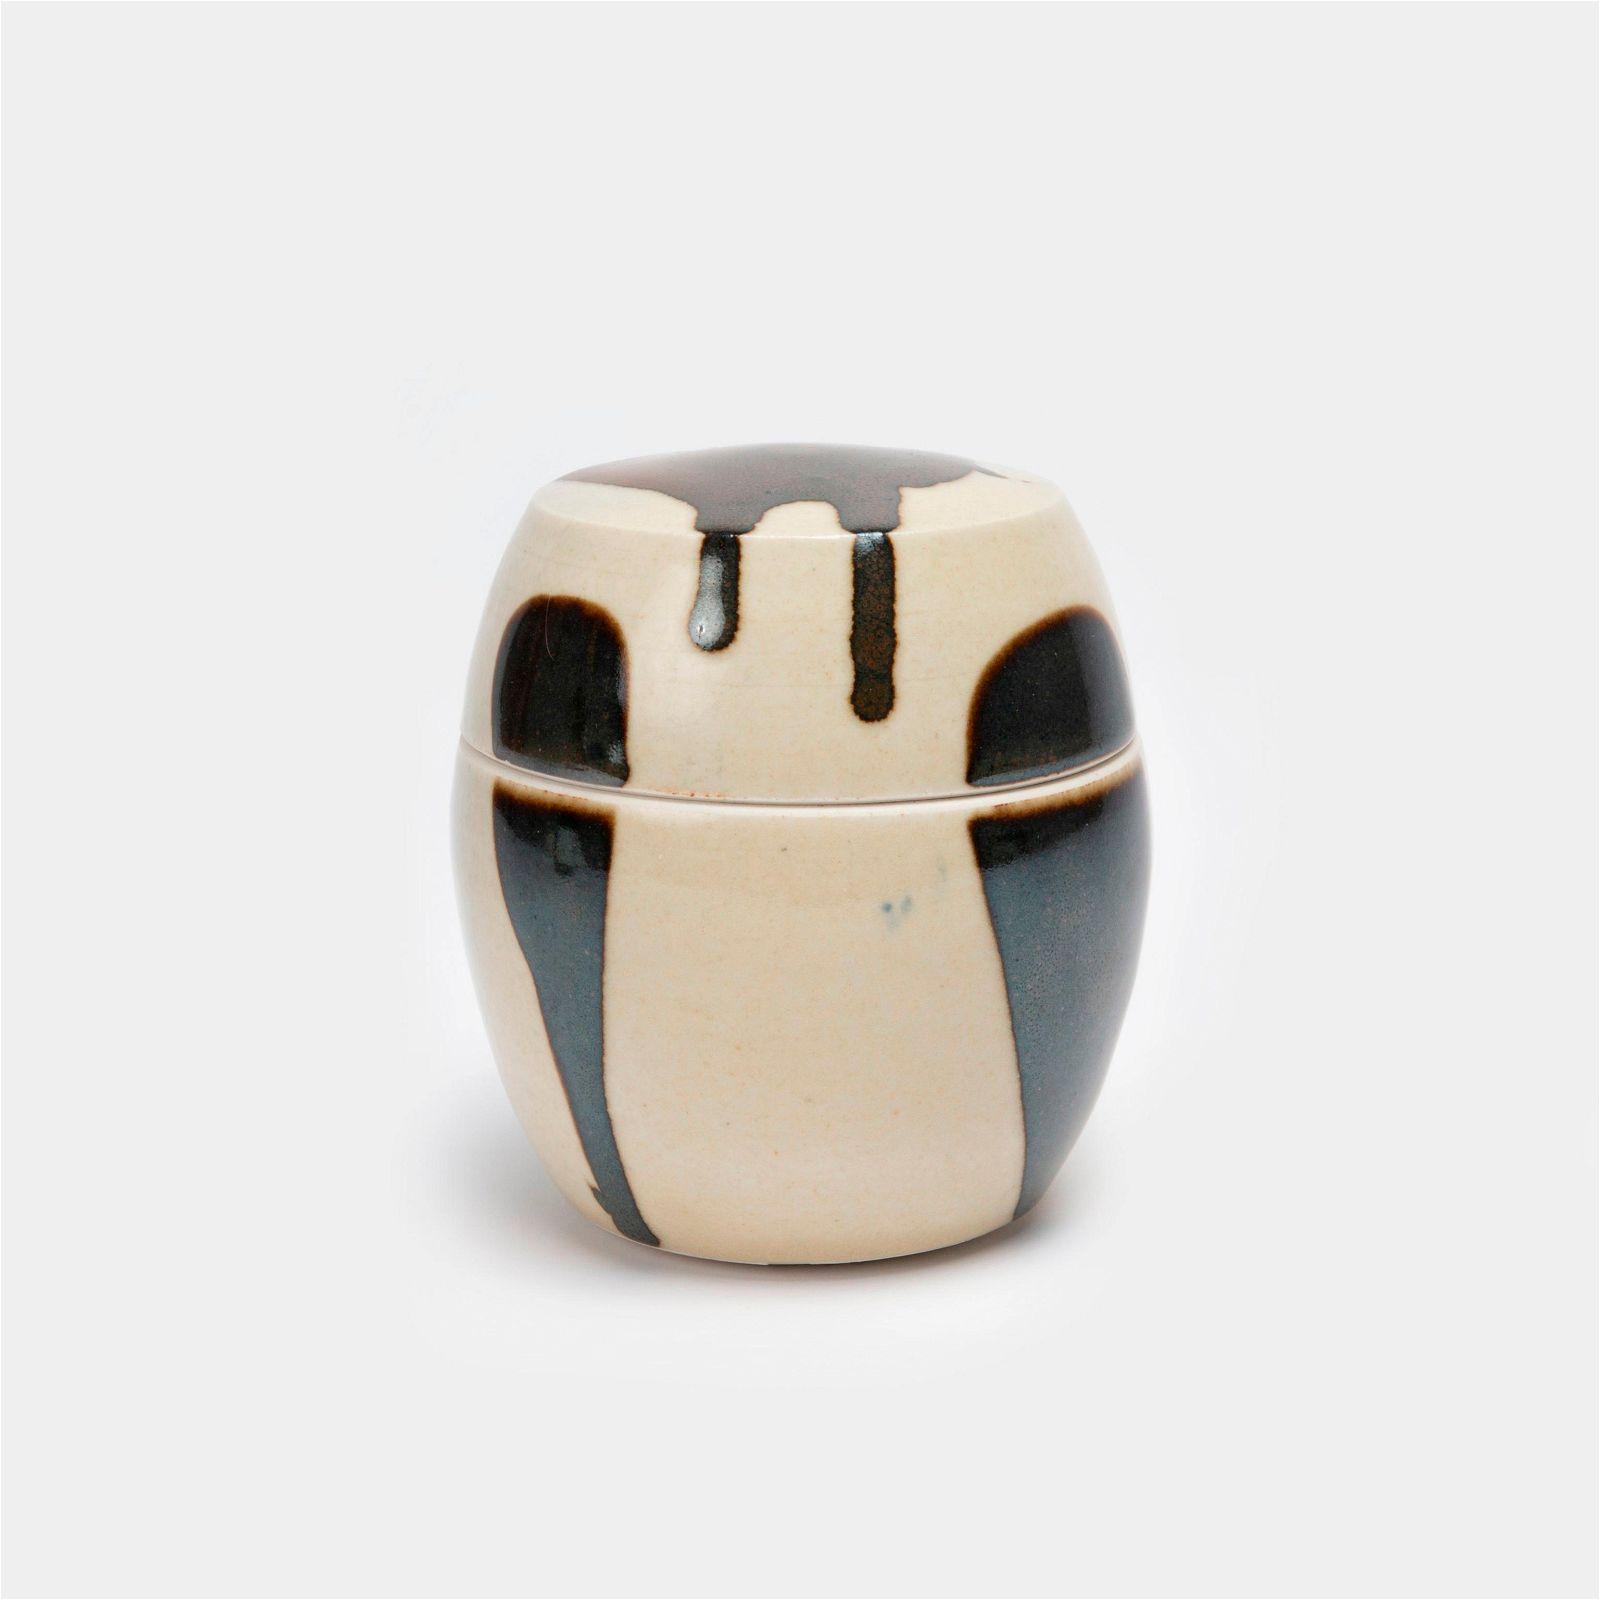 KEN FERGUSON / Porcelain Jar (1960s)